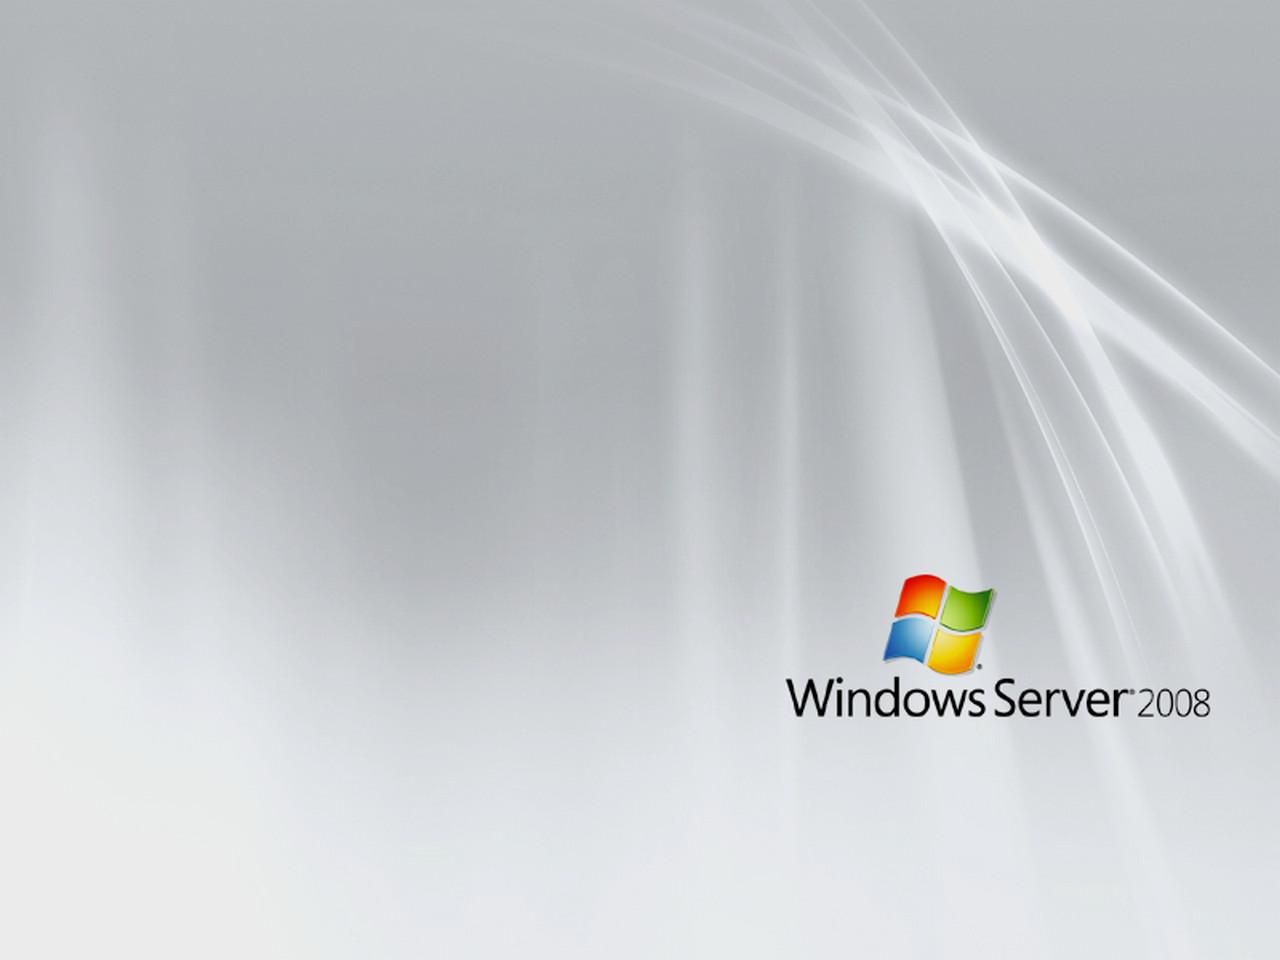 windows 2008 2015 auron2 windows server 2008 default desktop wallpaper 1280x960